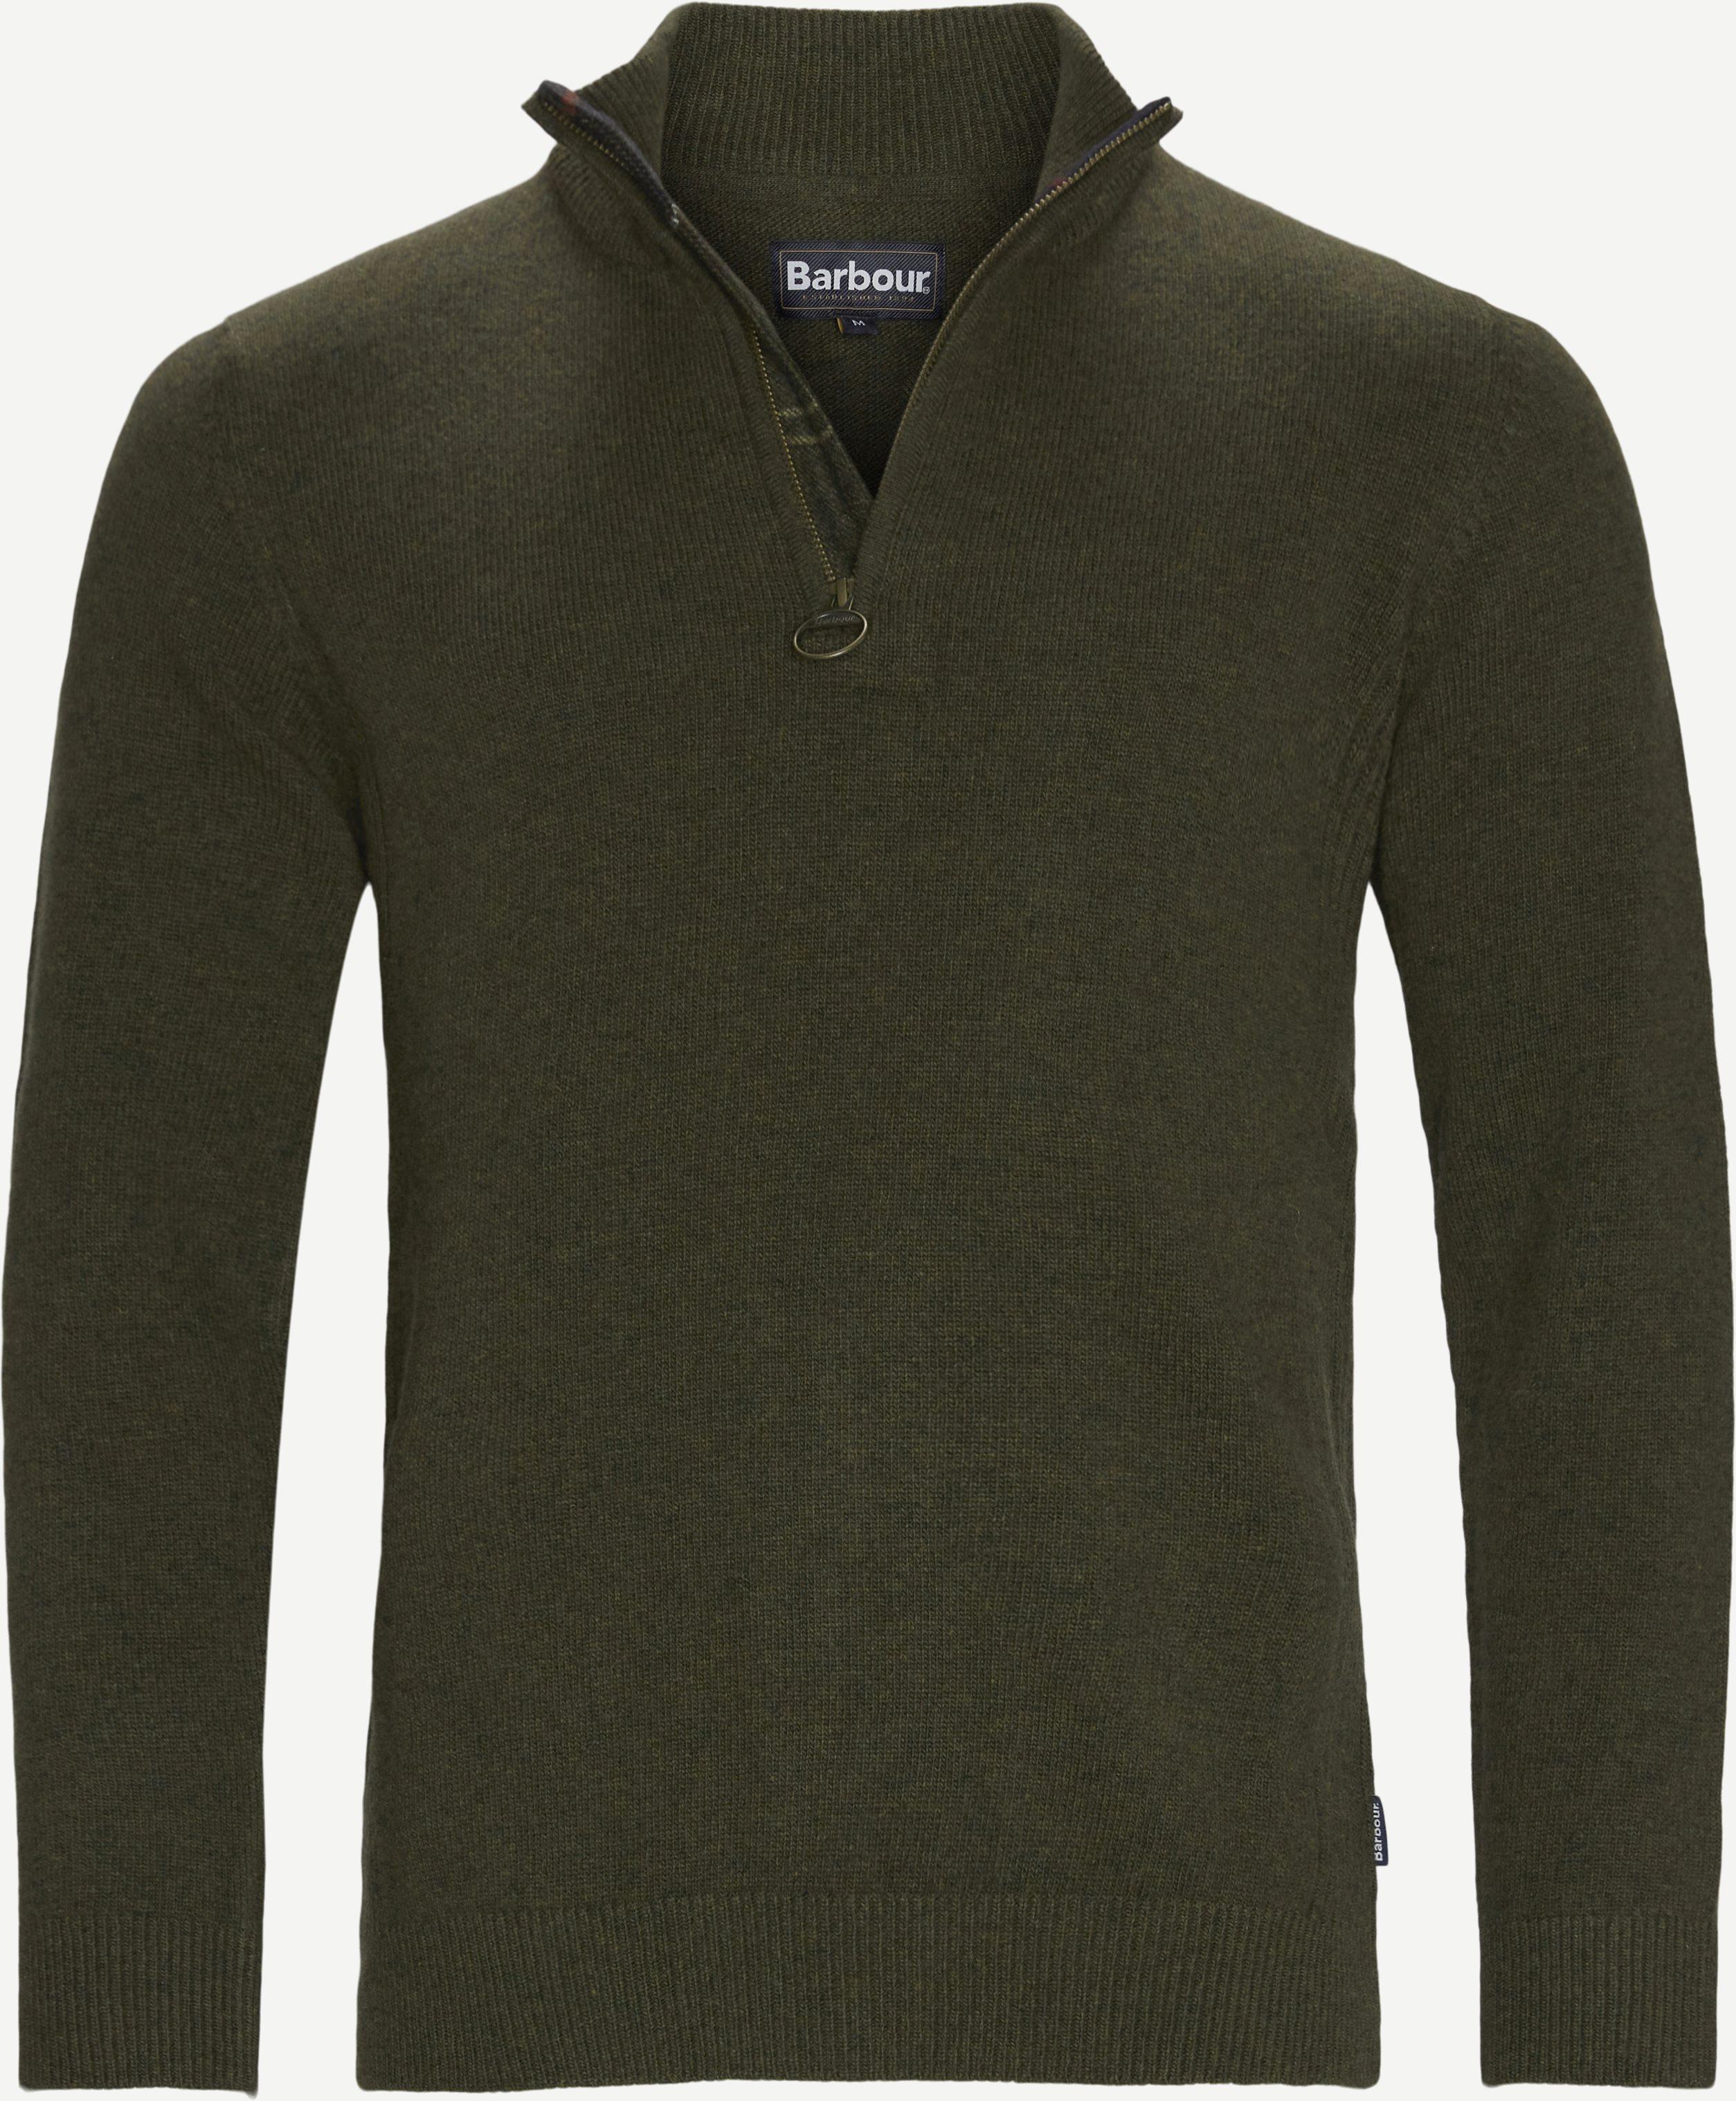 Knitwear - Regular fit - Army